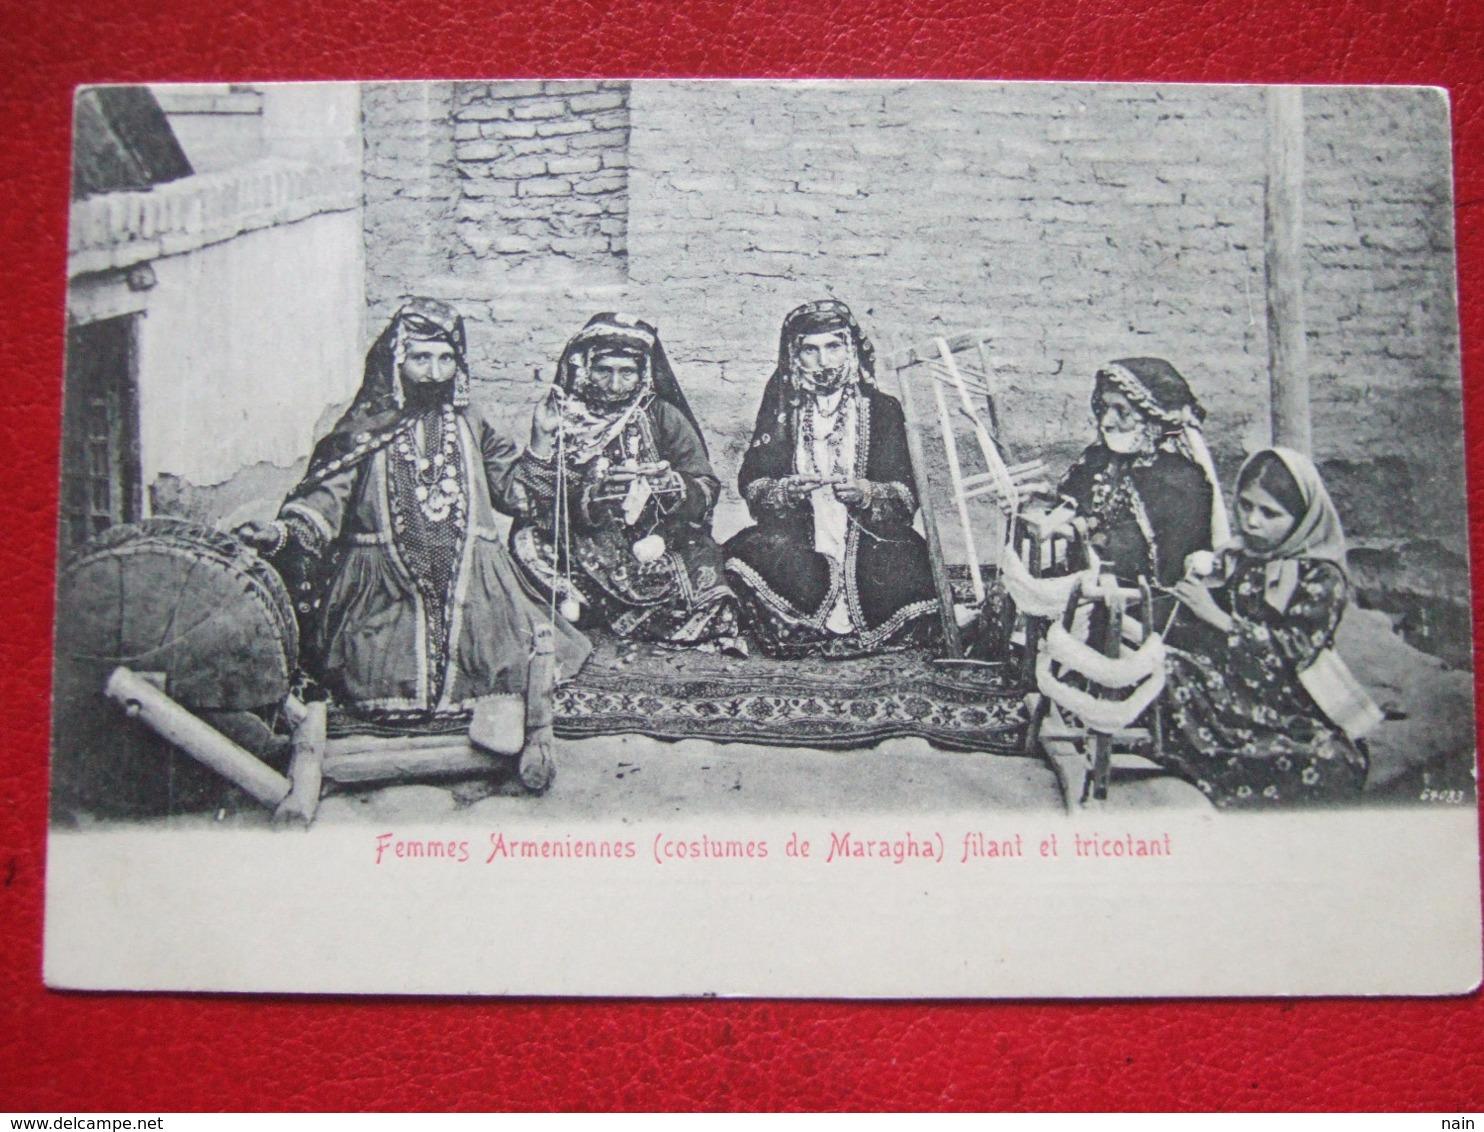 "ARMENIE - "" FEMMES ARMENIENNES ( COSTUMES DE MARAGHA ) FILANT ET TRICOTANT "" - + AFFT POSTES PERSANNES - "" TRES RARE "" - - Armenia"